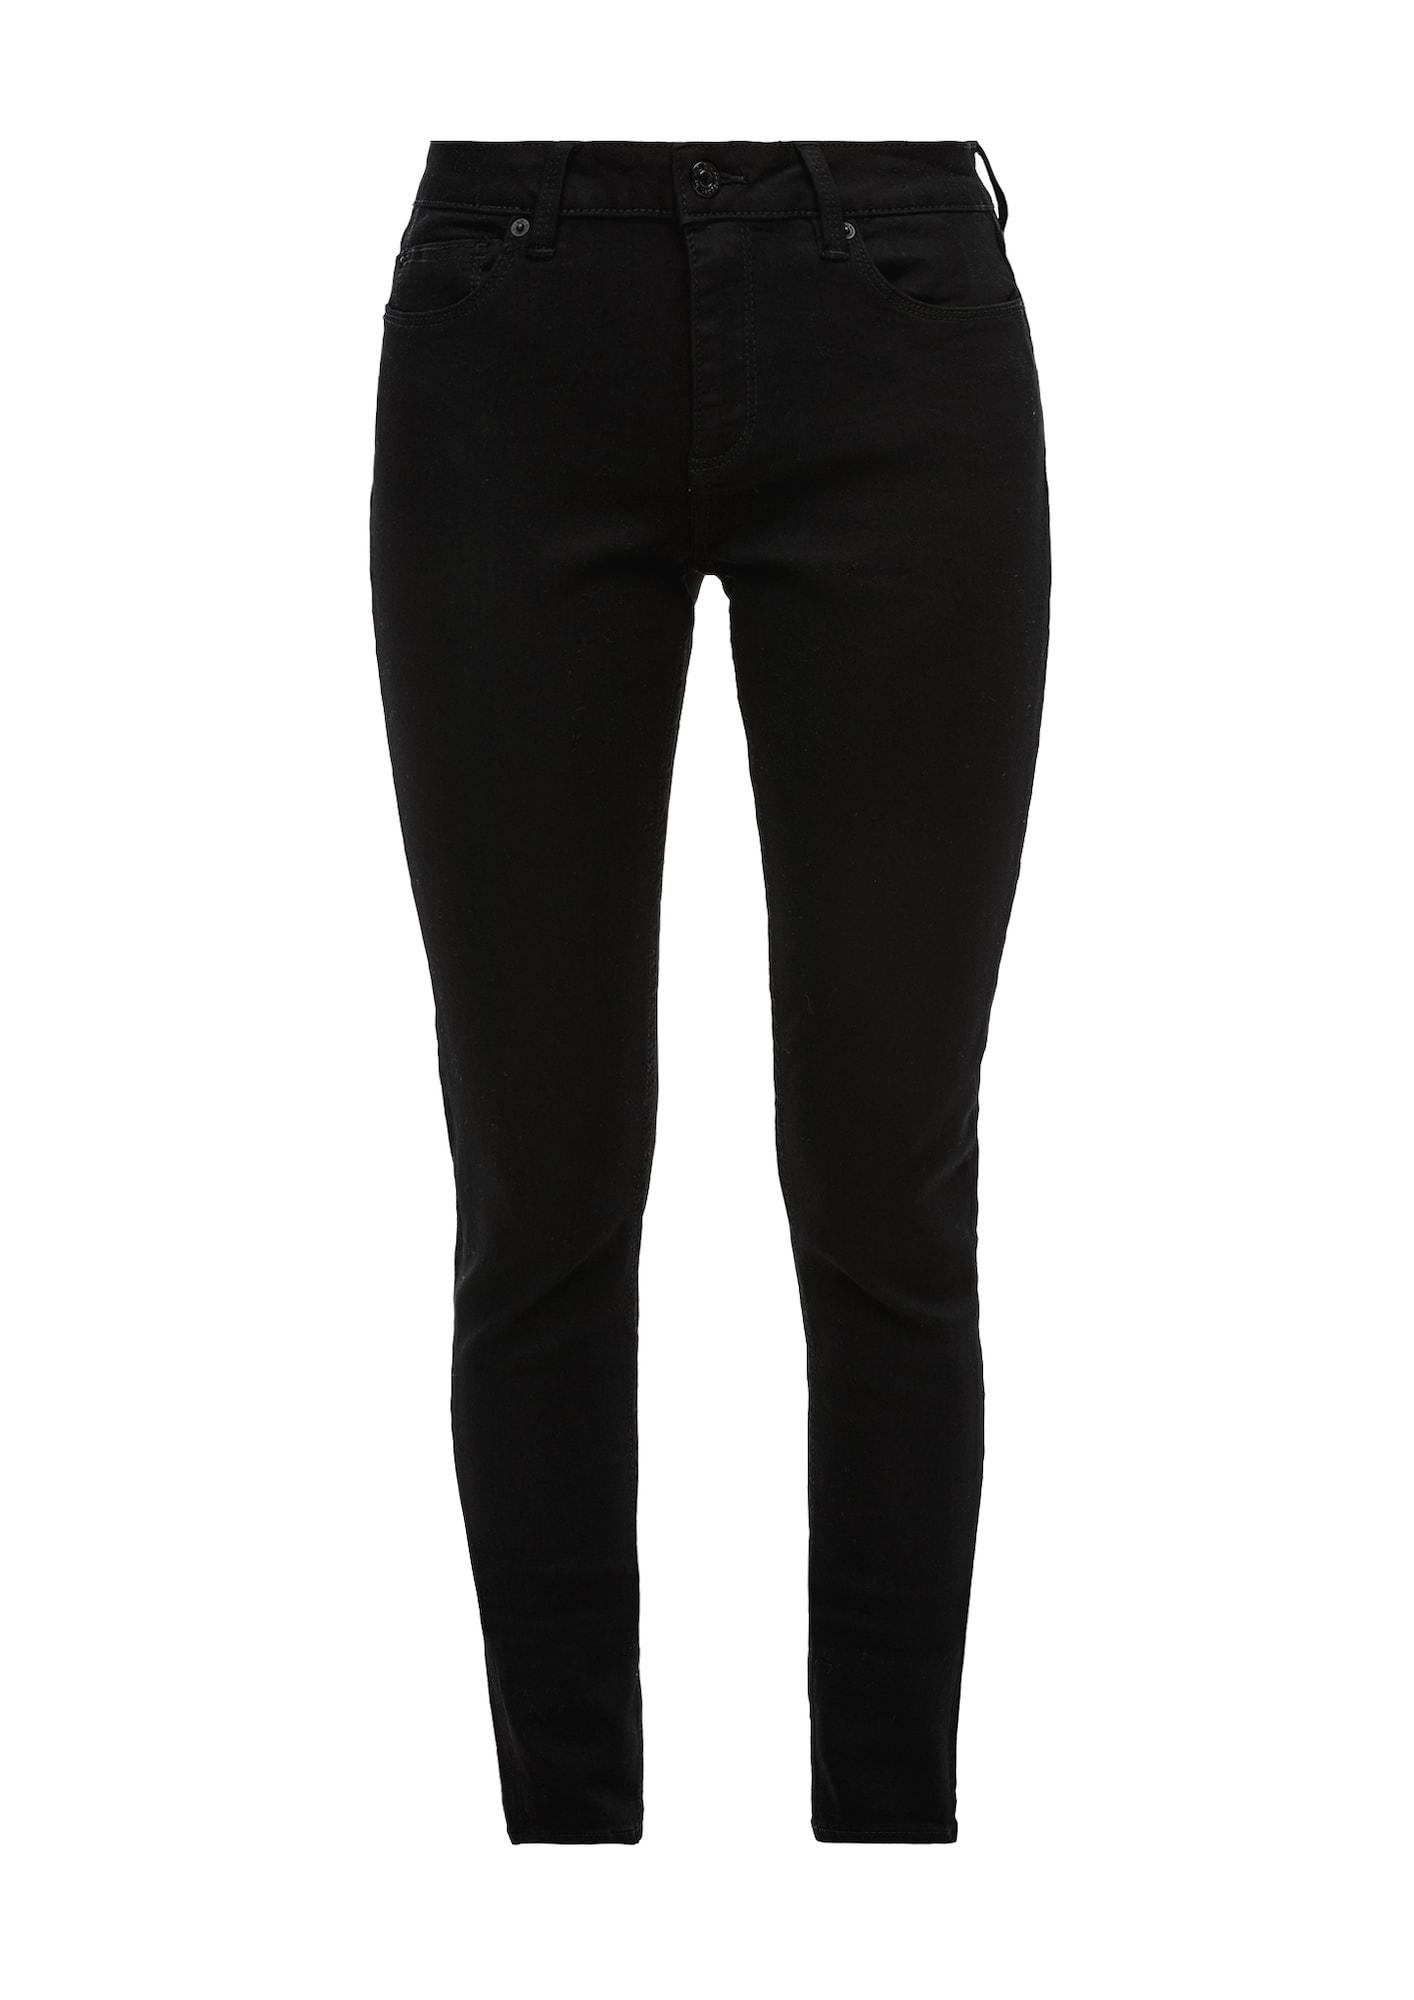 Q/S designed by Džinsai juodo džinso spalva